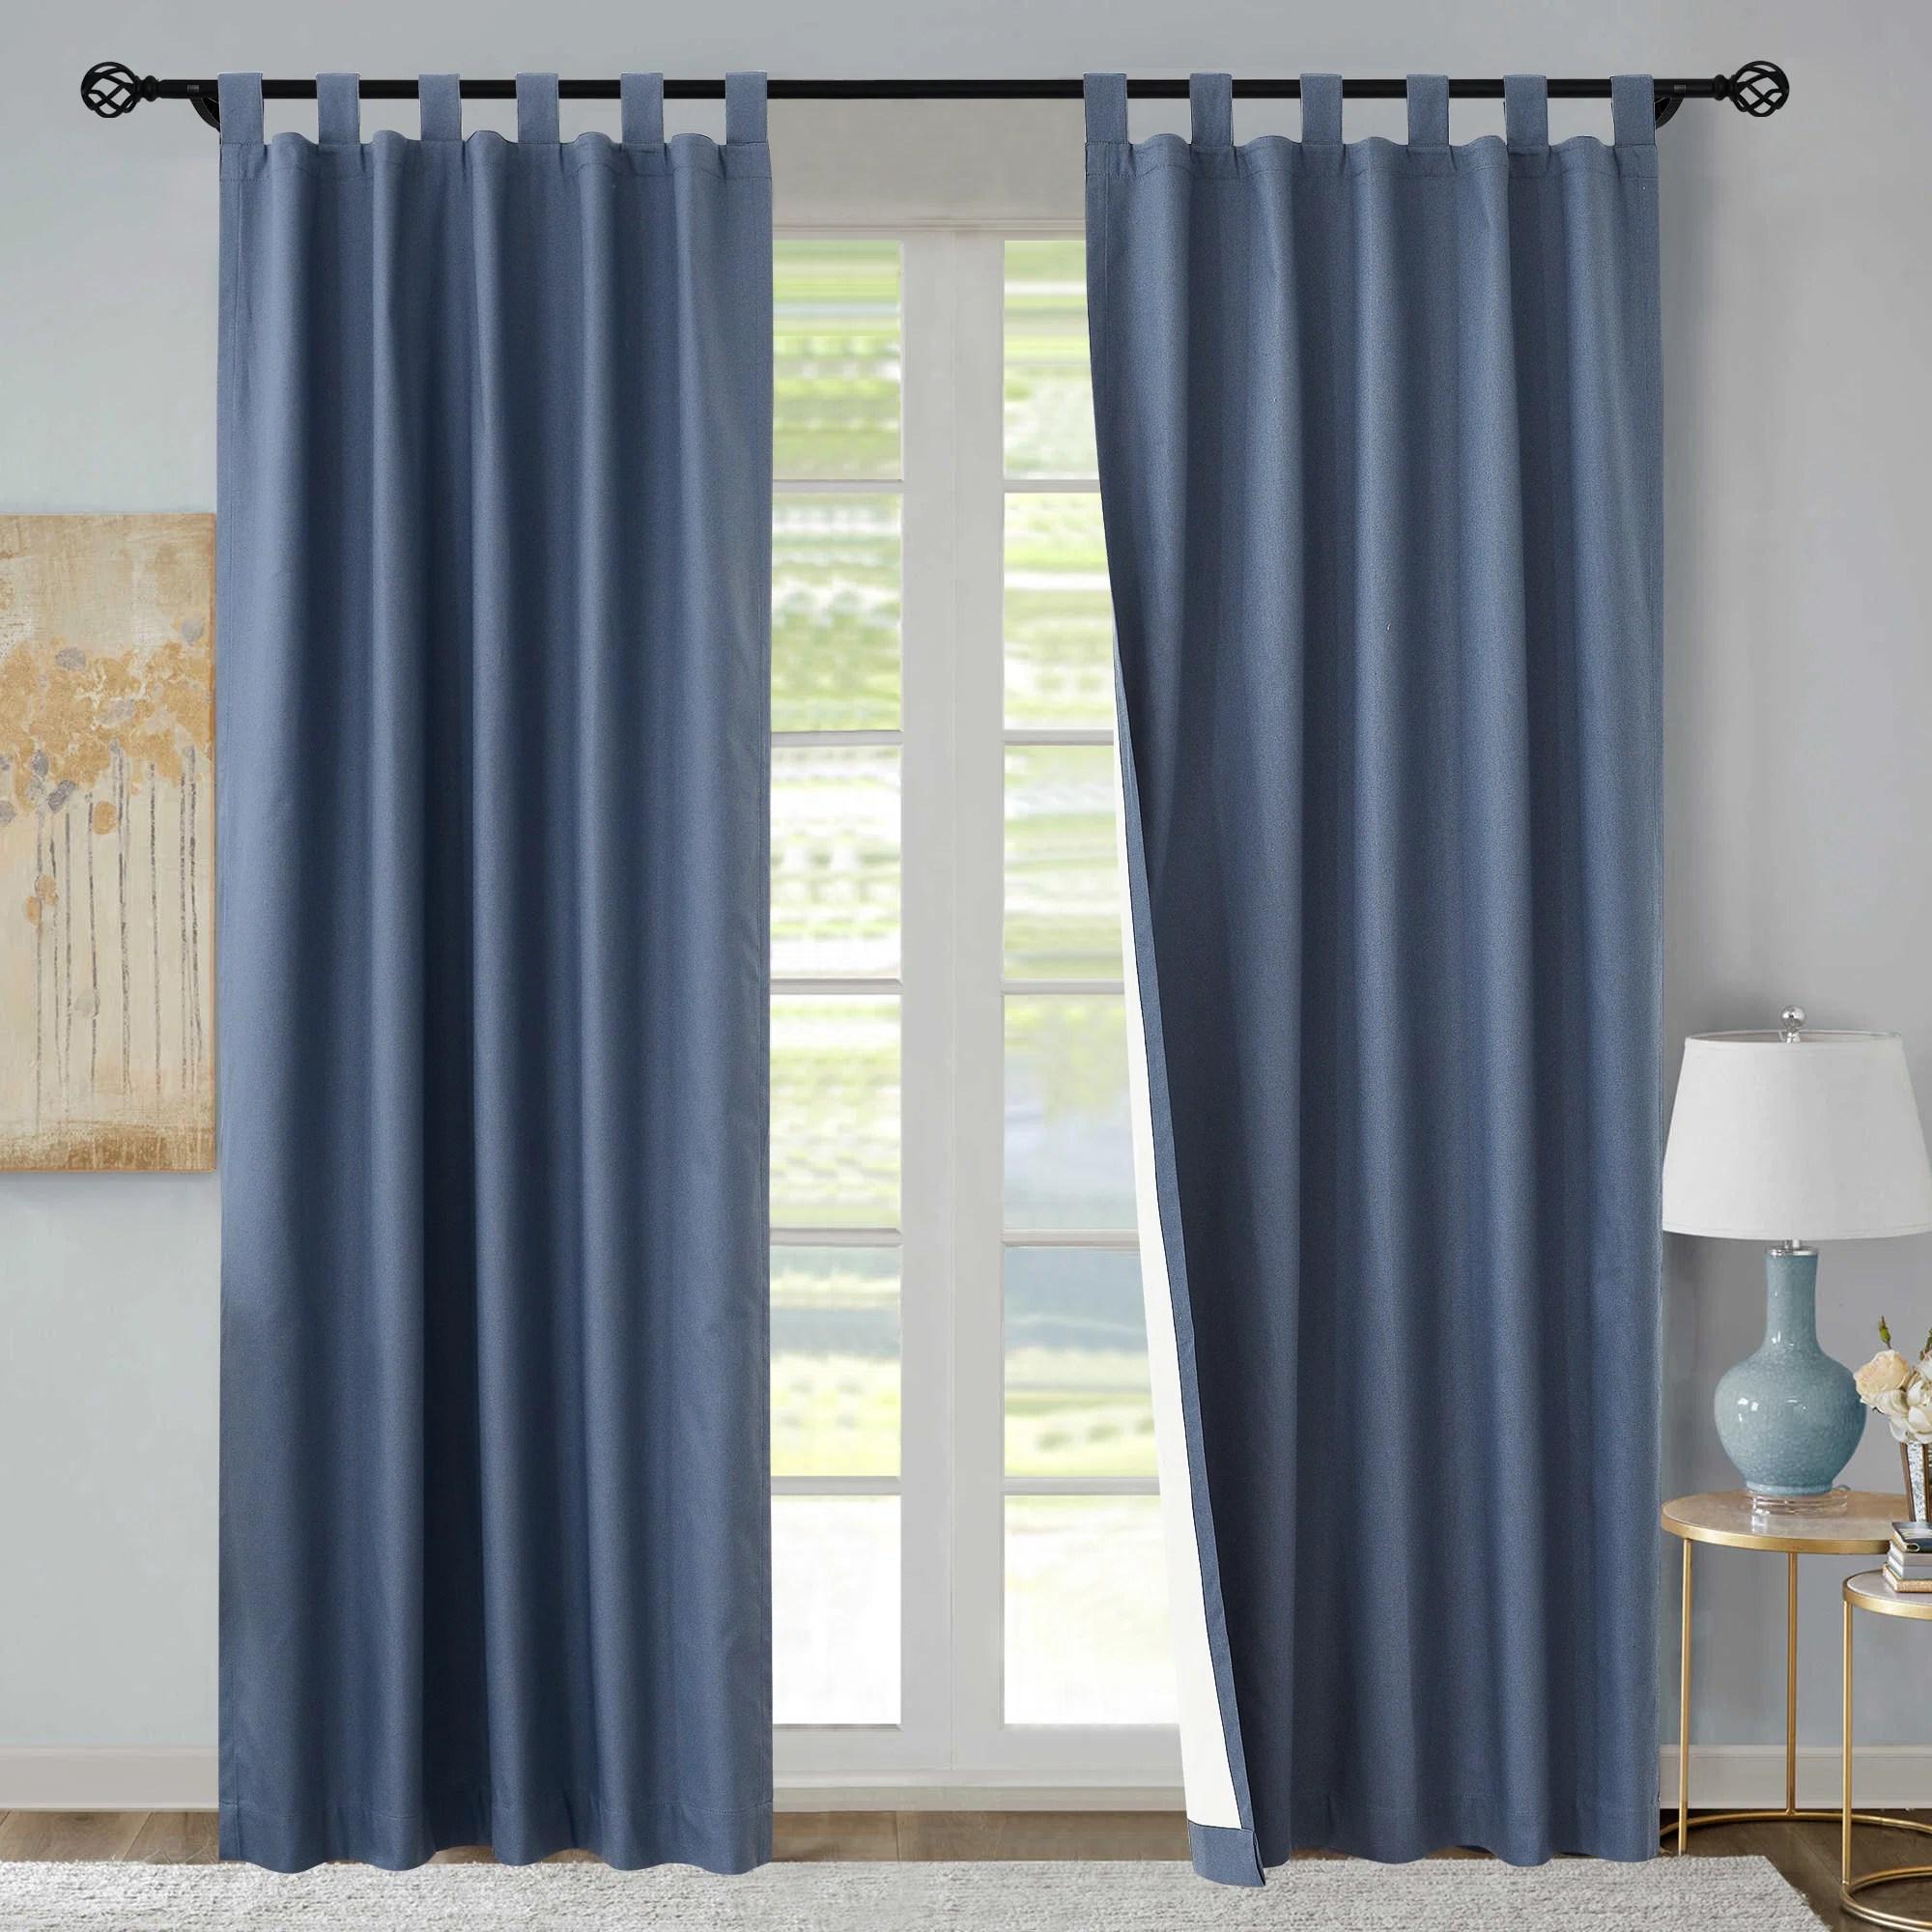 patio sliding door curtains drapes